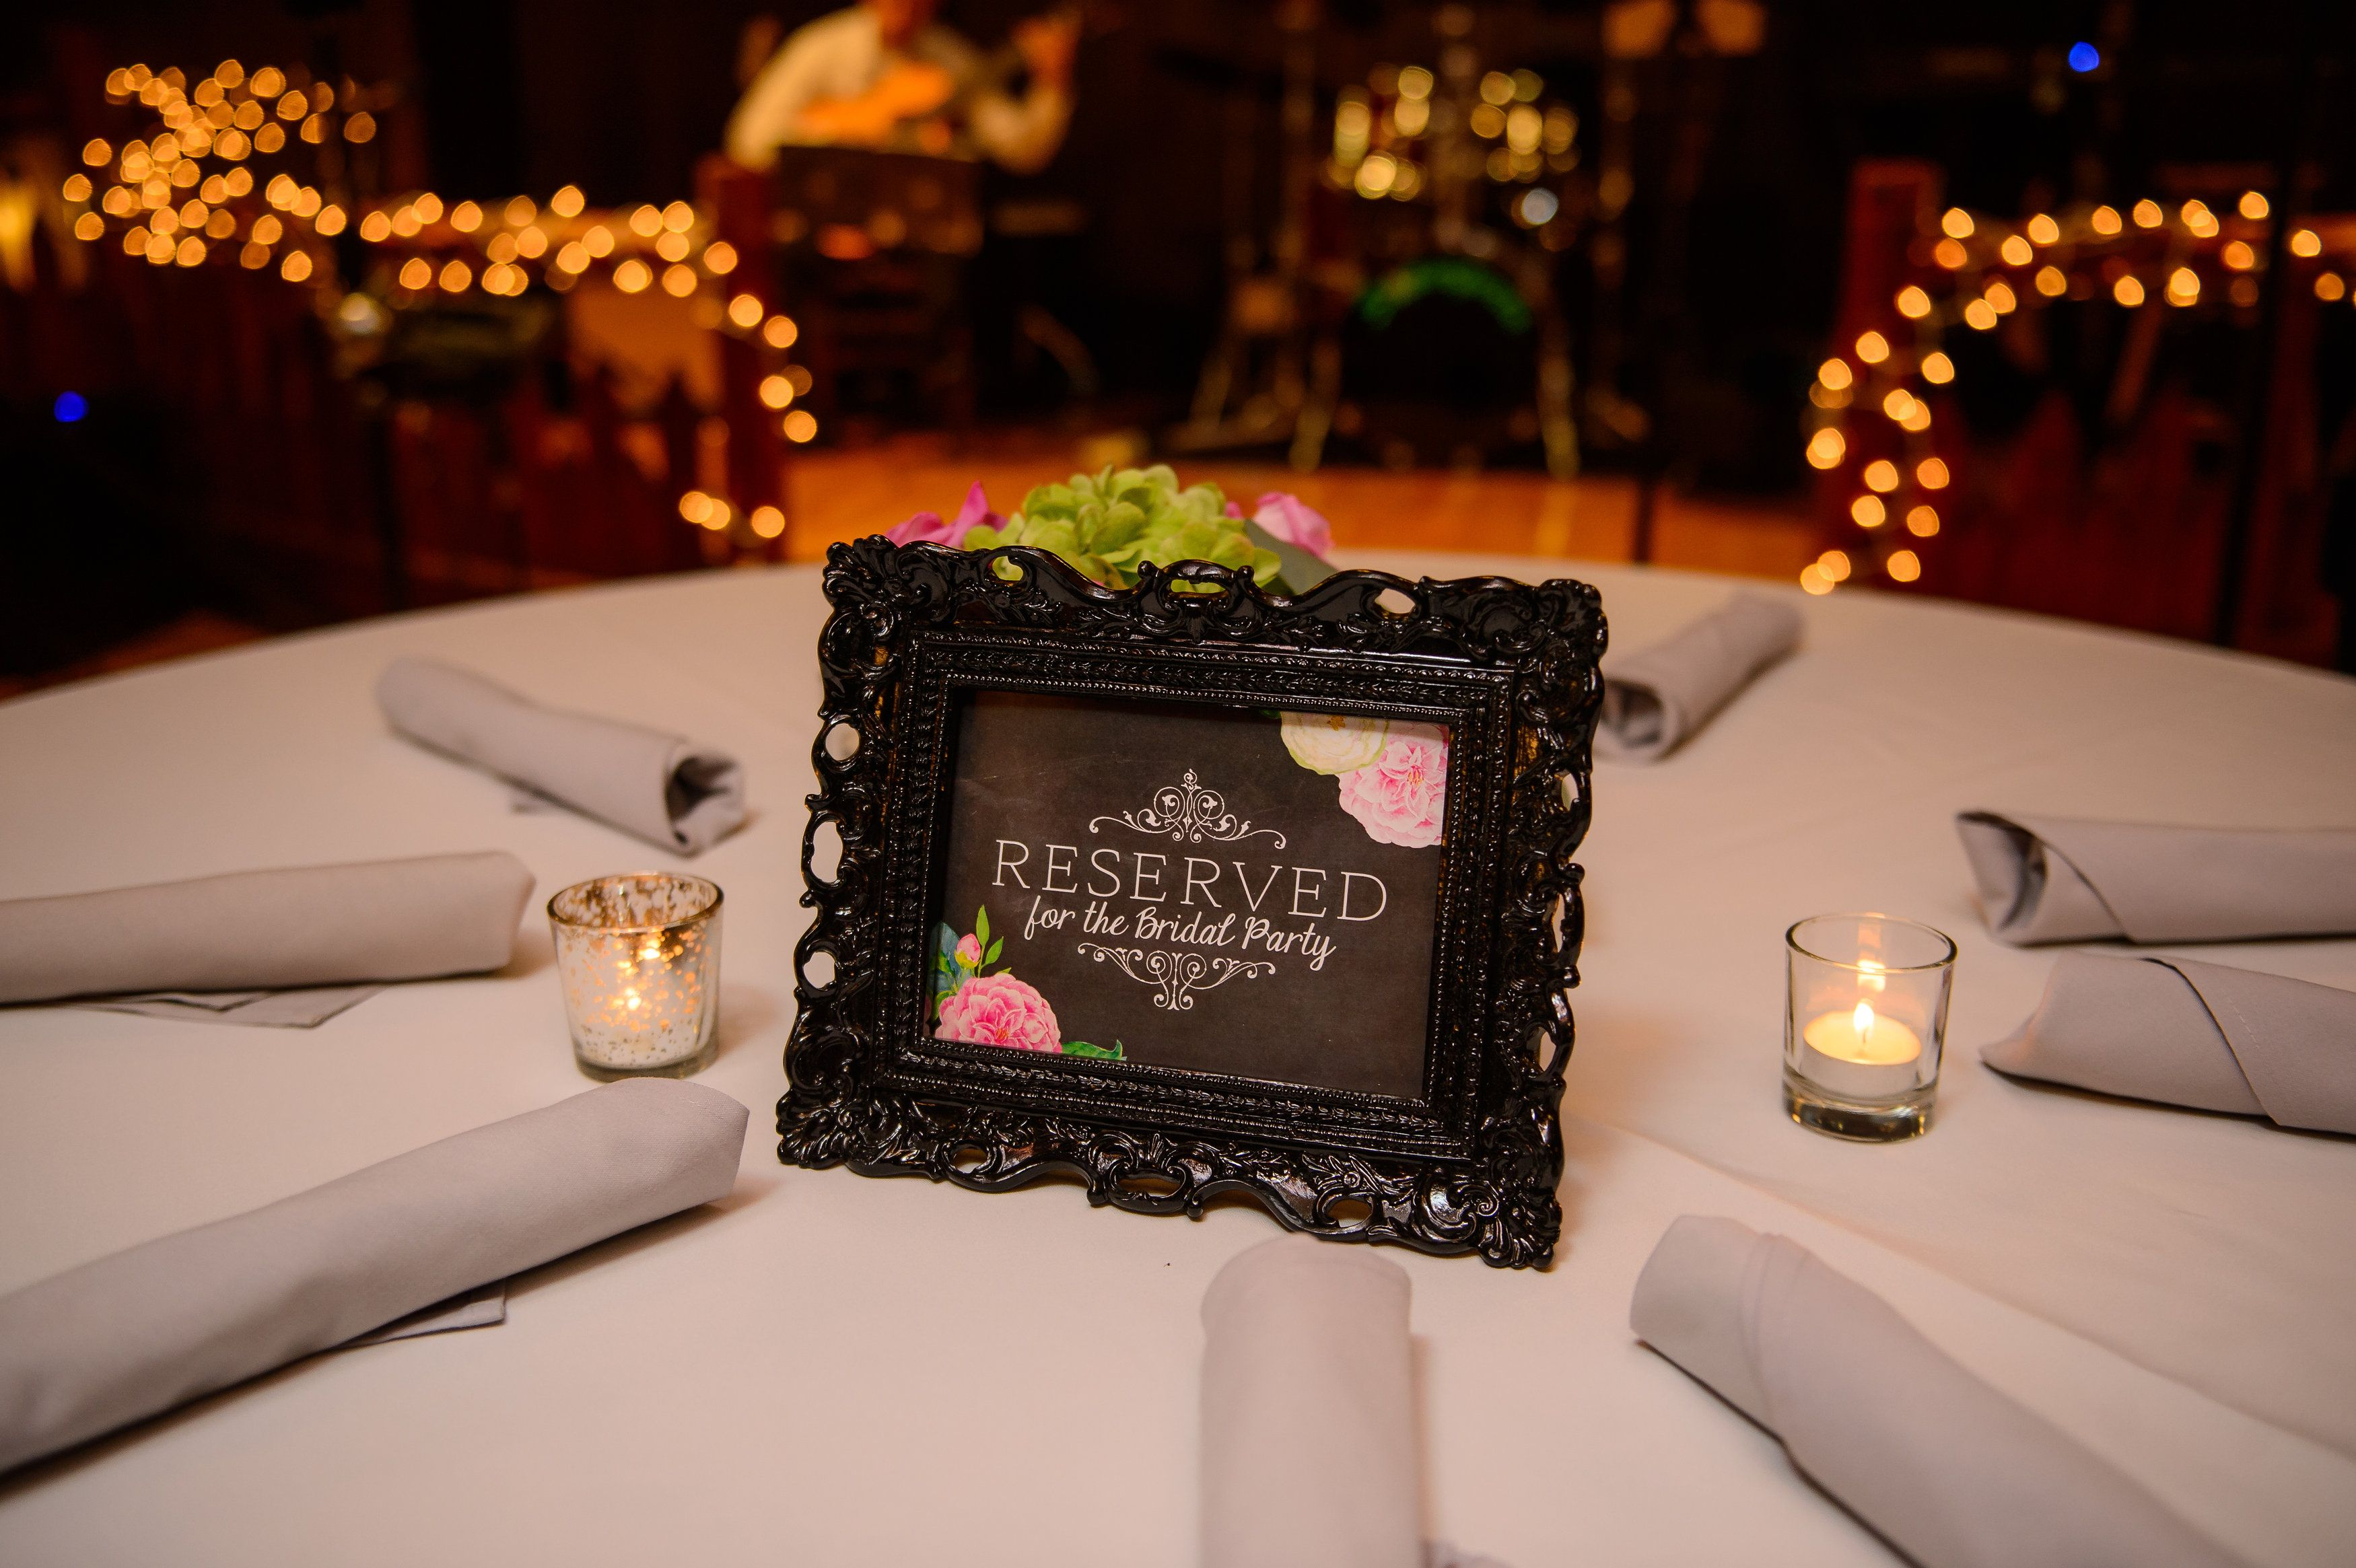 Simple but pretty reserved signs!  Photo by: Adam Padgett Weddings.   #ptopofthebluegrass #ptopweddings2016 #weddingreception #weddingceremony #weddingdecor #weddingreservedsigns #weddingplanner #weddingcenterpieces #distilleryweddings #outsideweddings #weddingcatering #weddingvenues